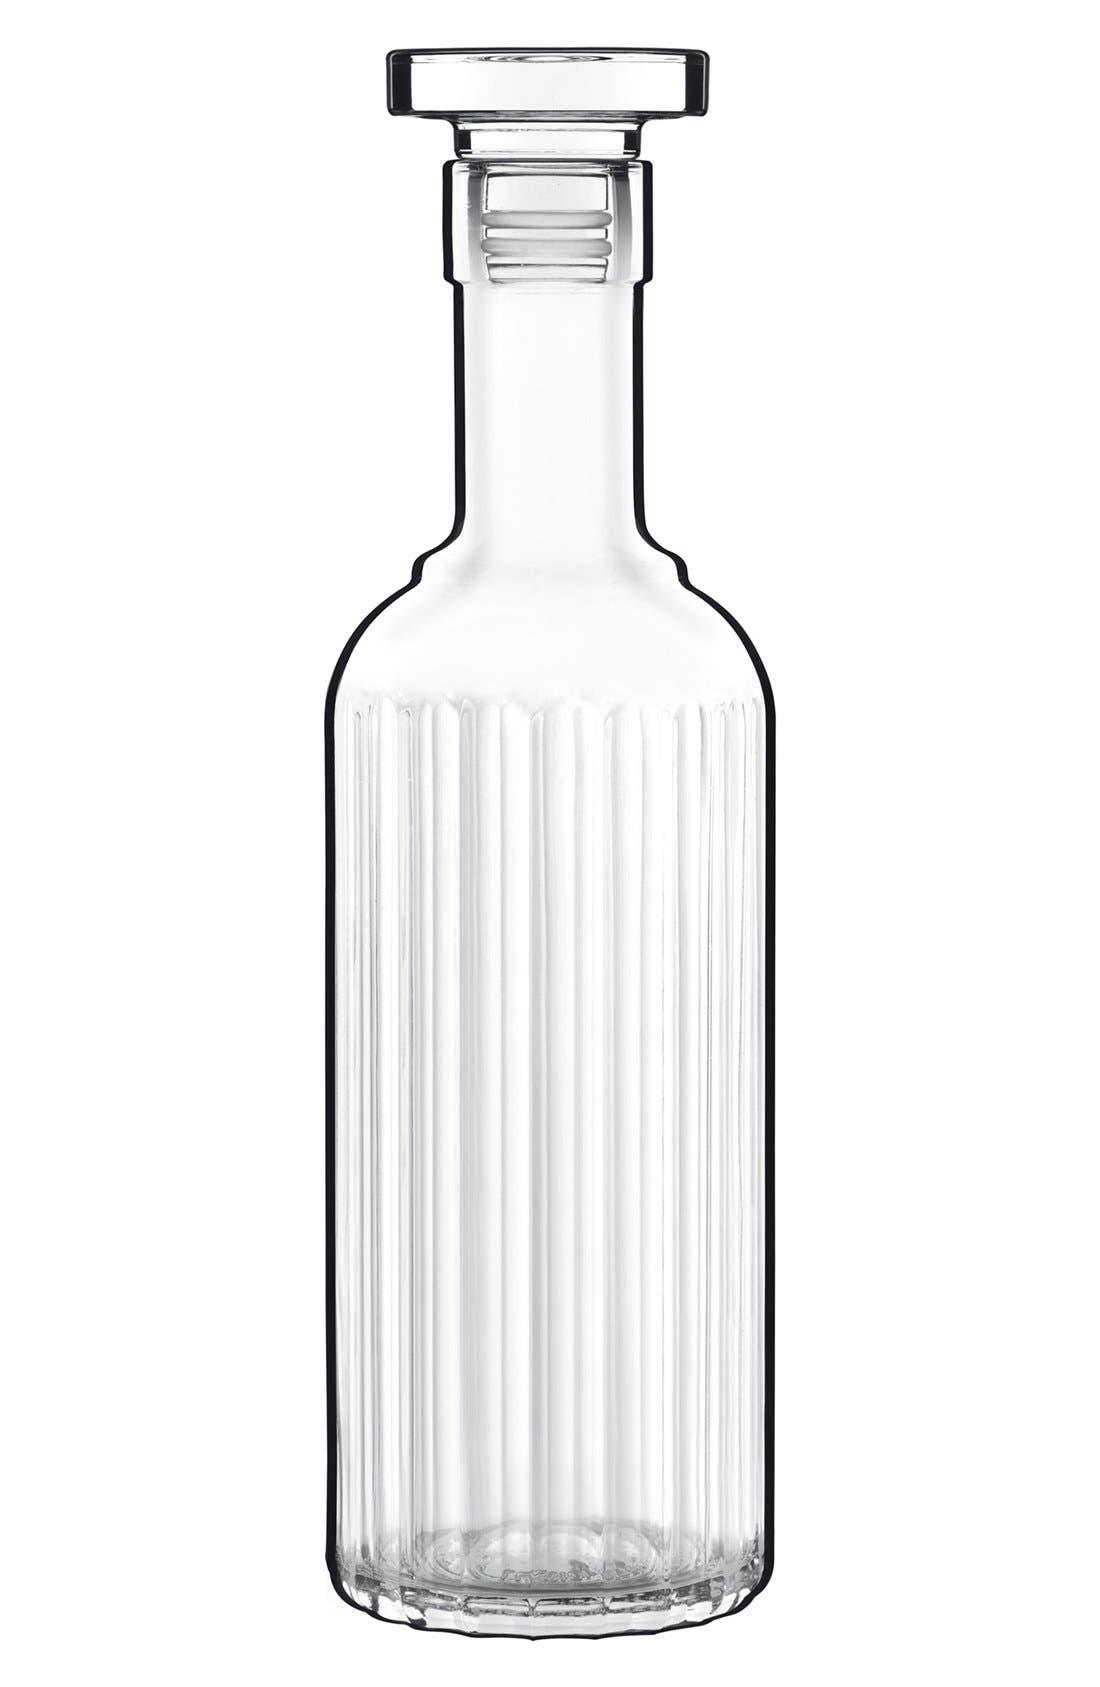 'Bach' Spirits Bottle,                         Main,                         color, 100